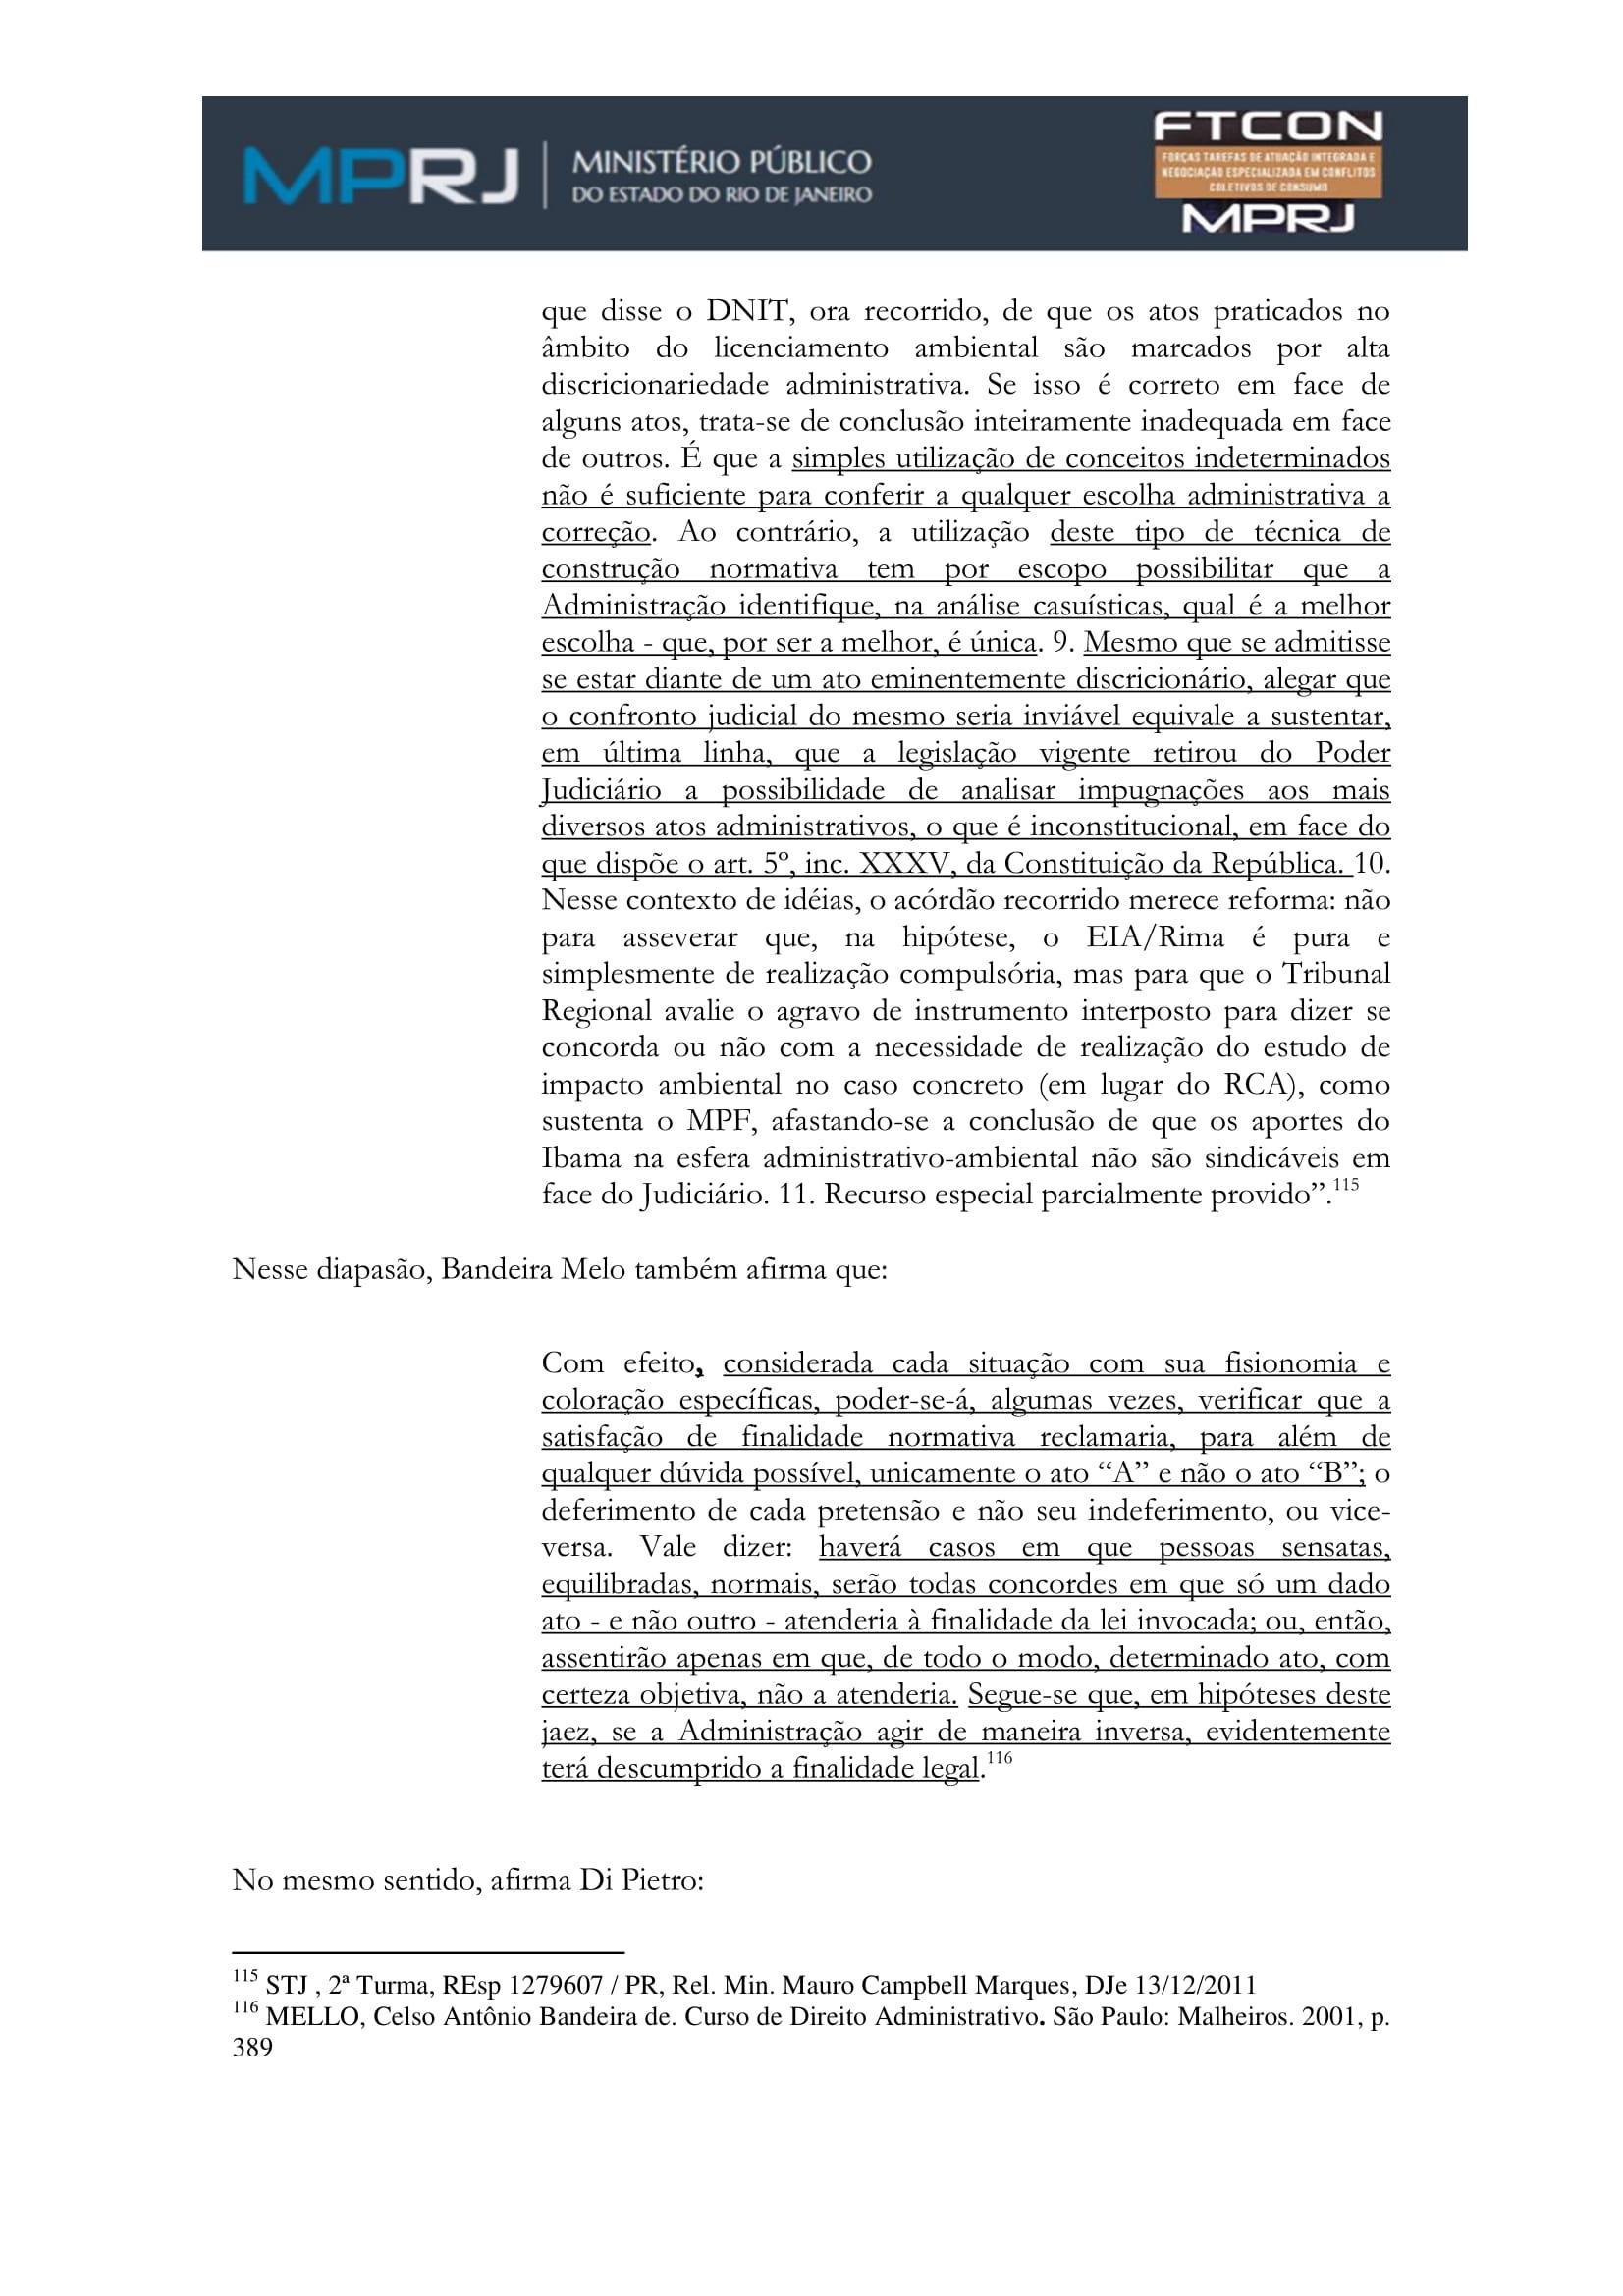 acp_caducidade_onibus_dr_rt-125